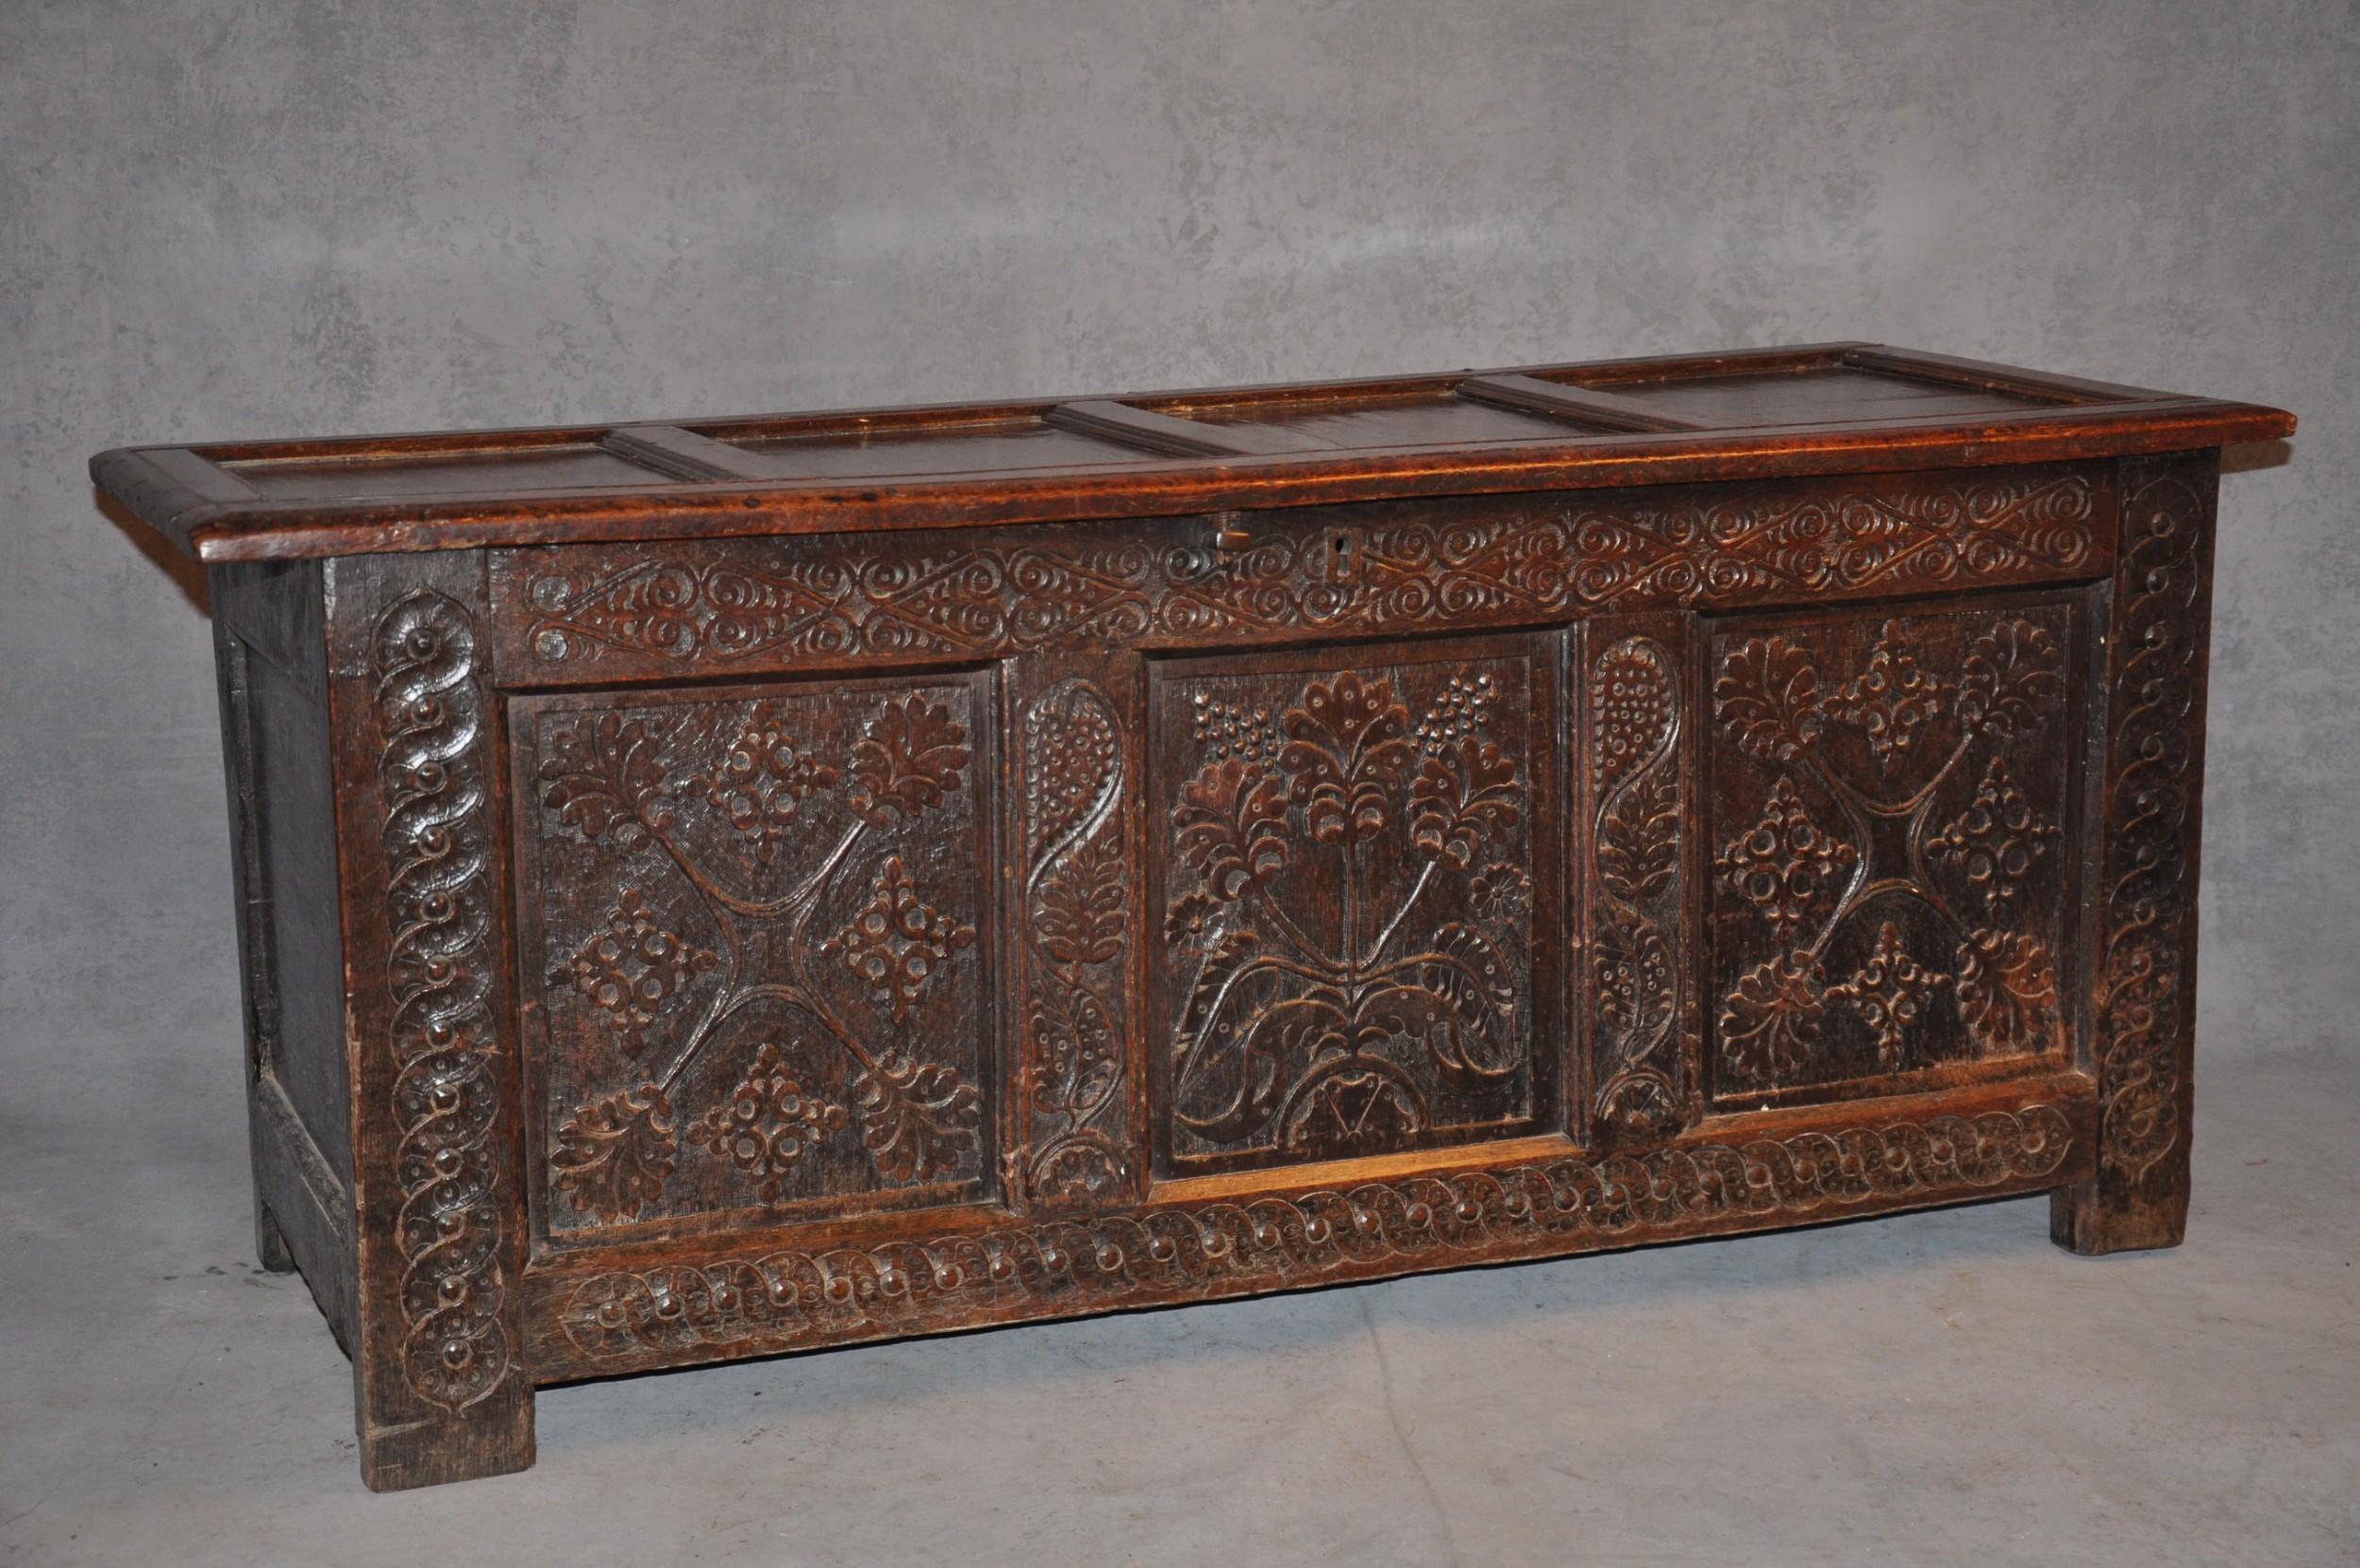 17th century paneled oak coffer